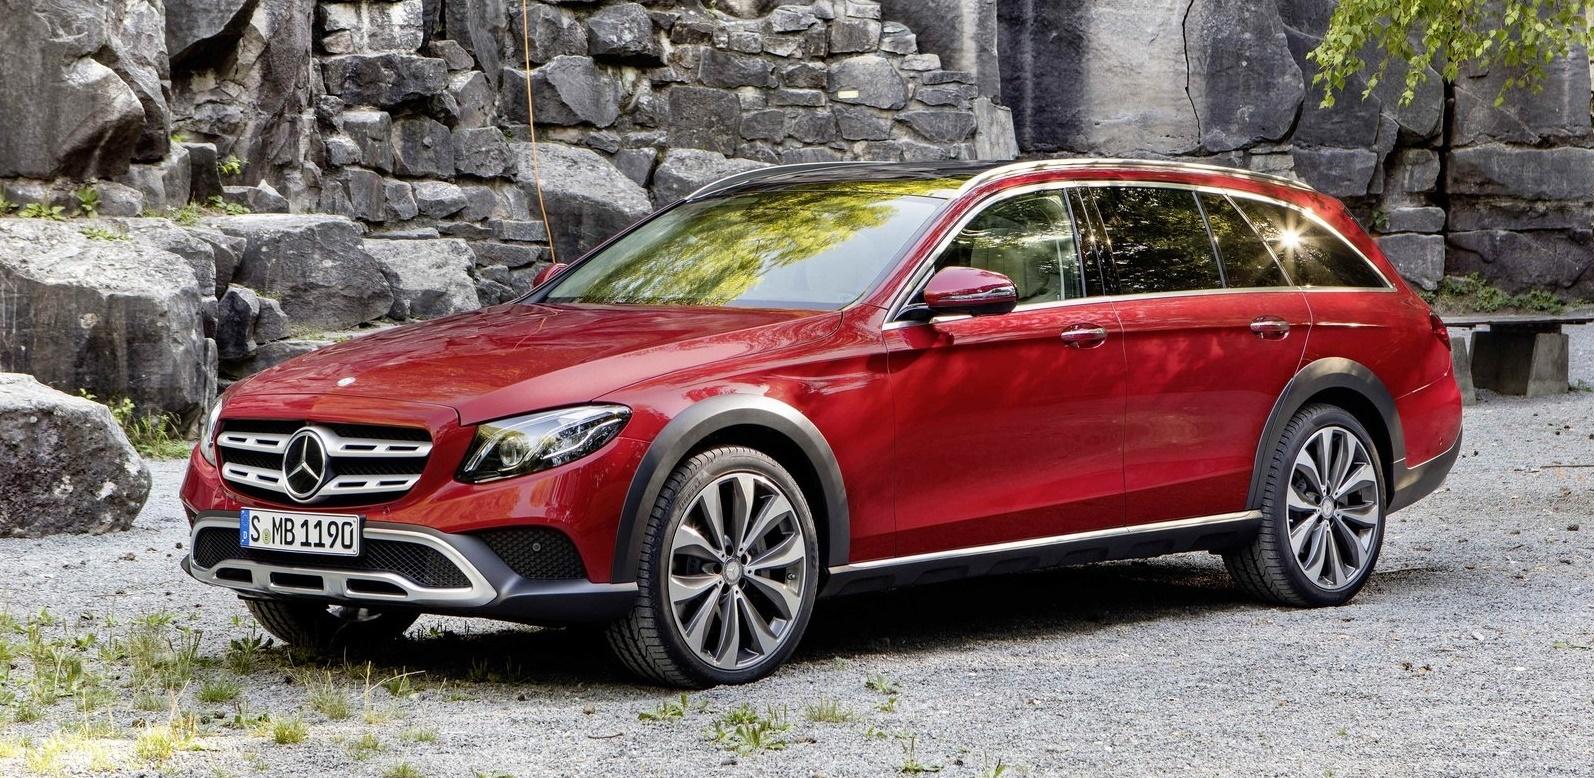 Mercedes Classe E All-Terrain, elegante fuoristrada